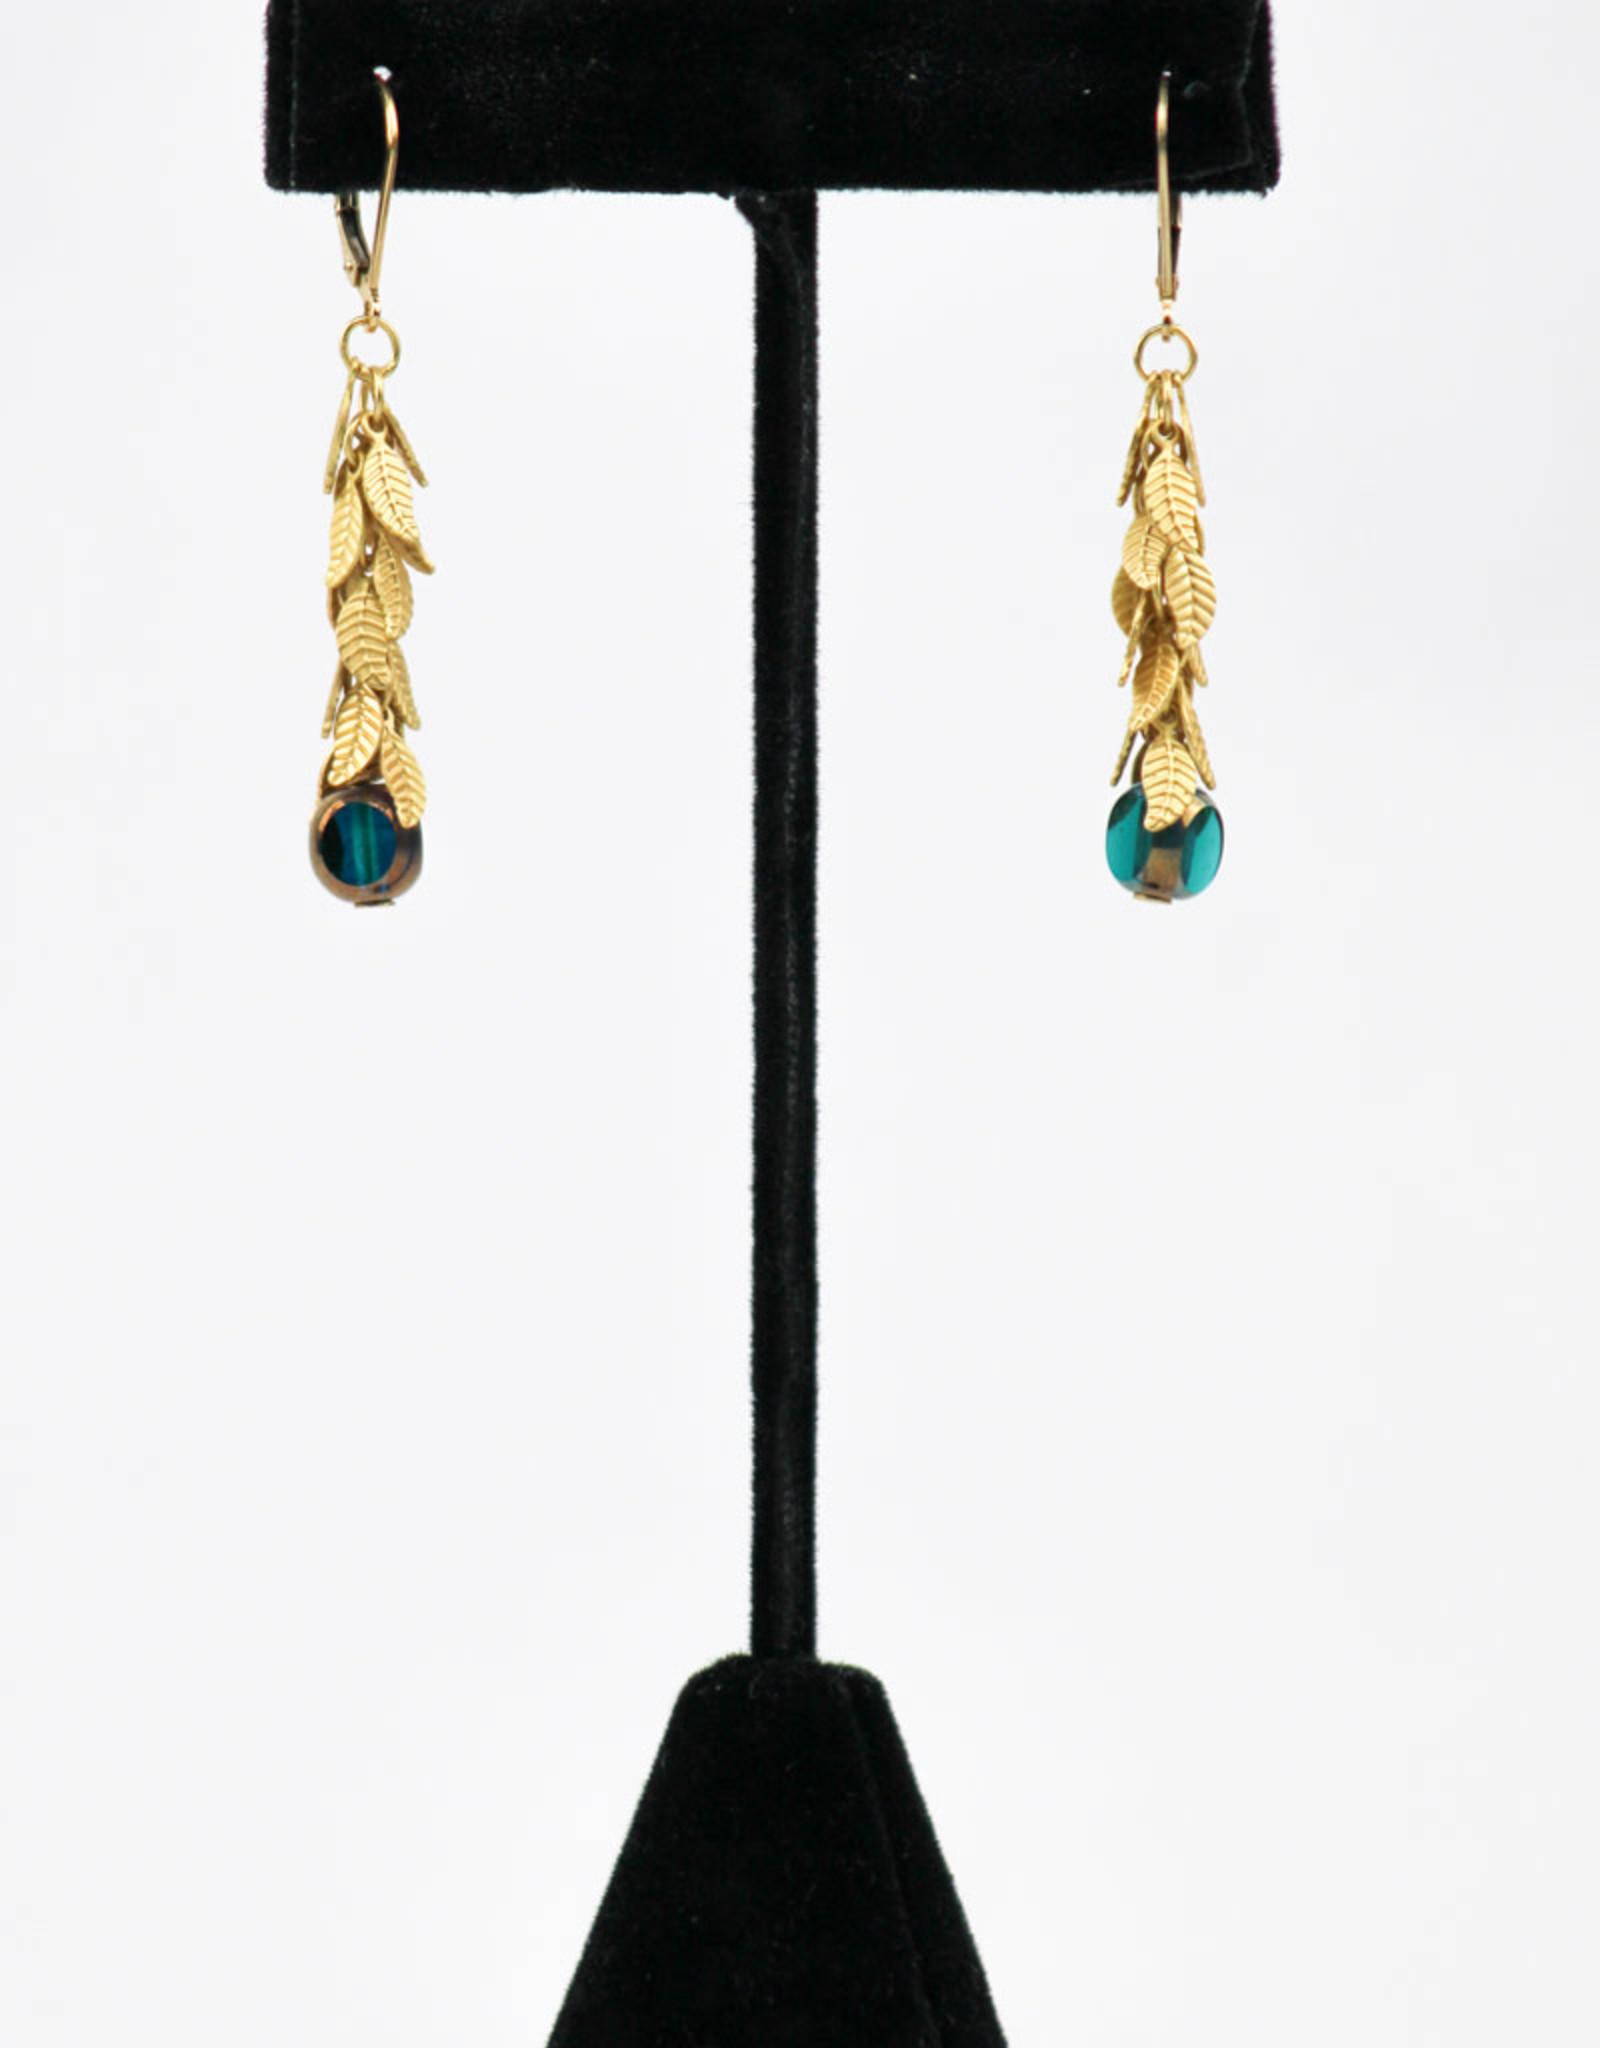 Stefanie Wolf Designs Fringe Drop Earrings